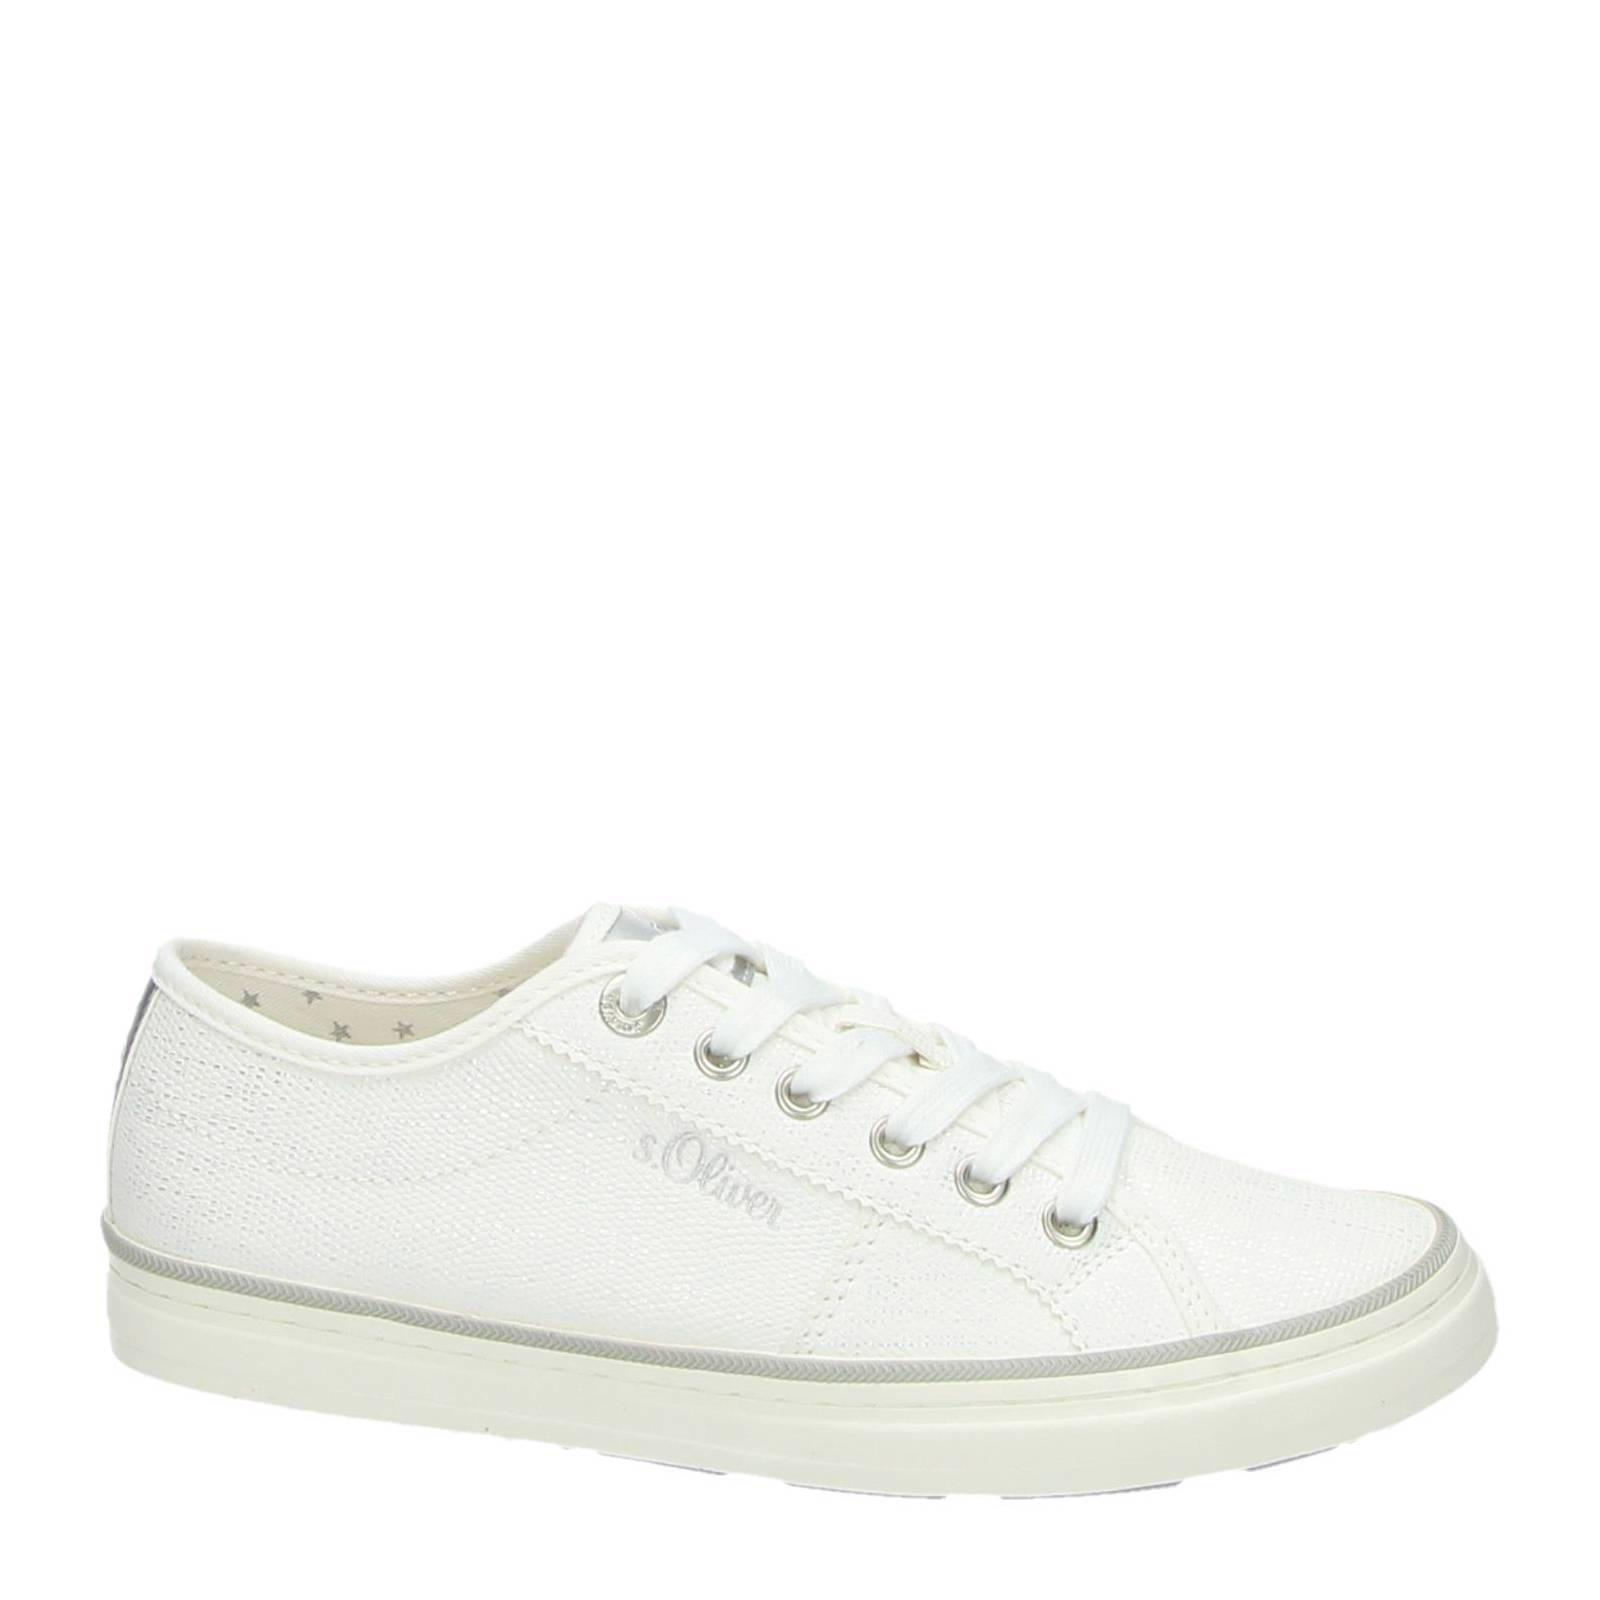 s.Oliver sneakers   wehkamp